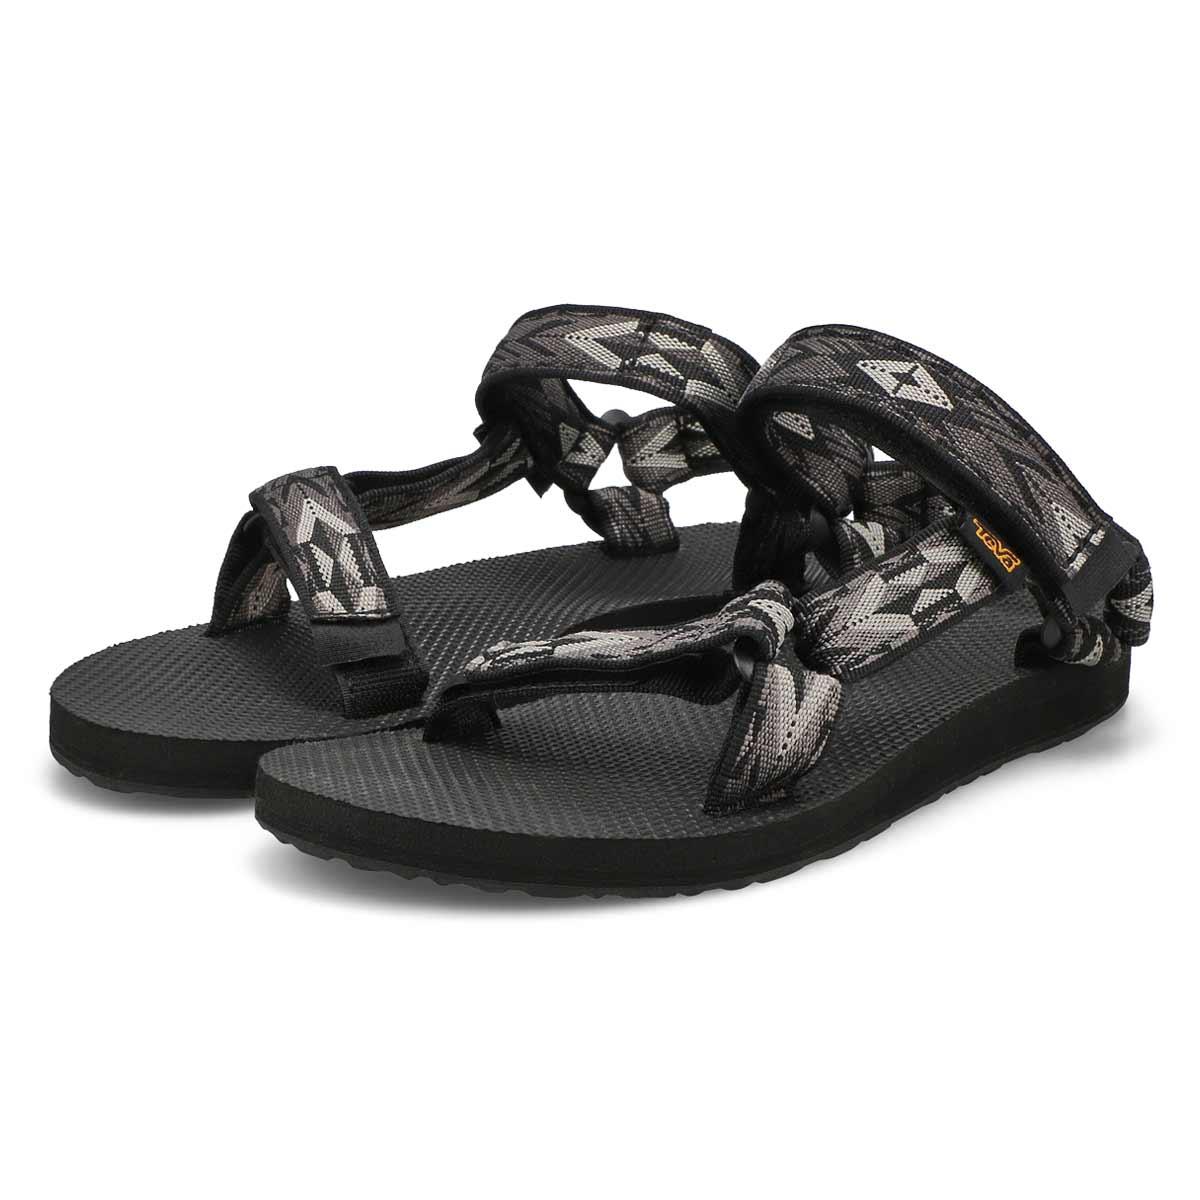 Women's Original Universal Sport Sandal - Blk/Mult